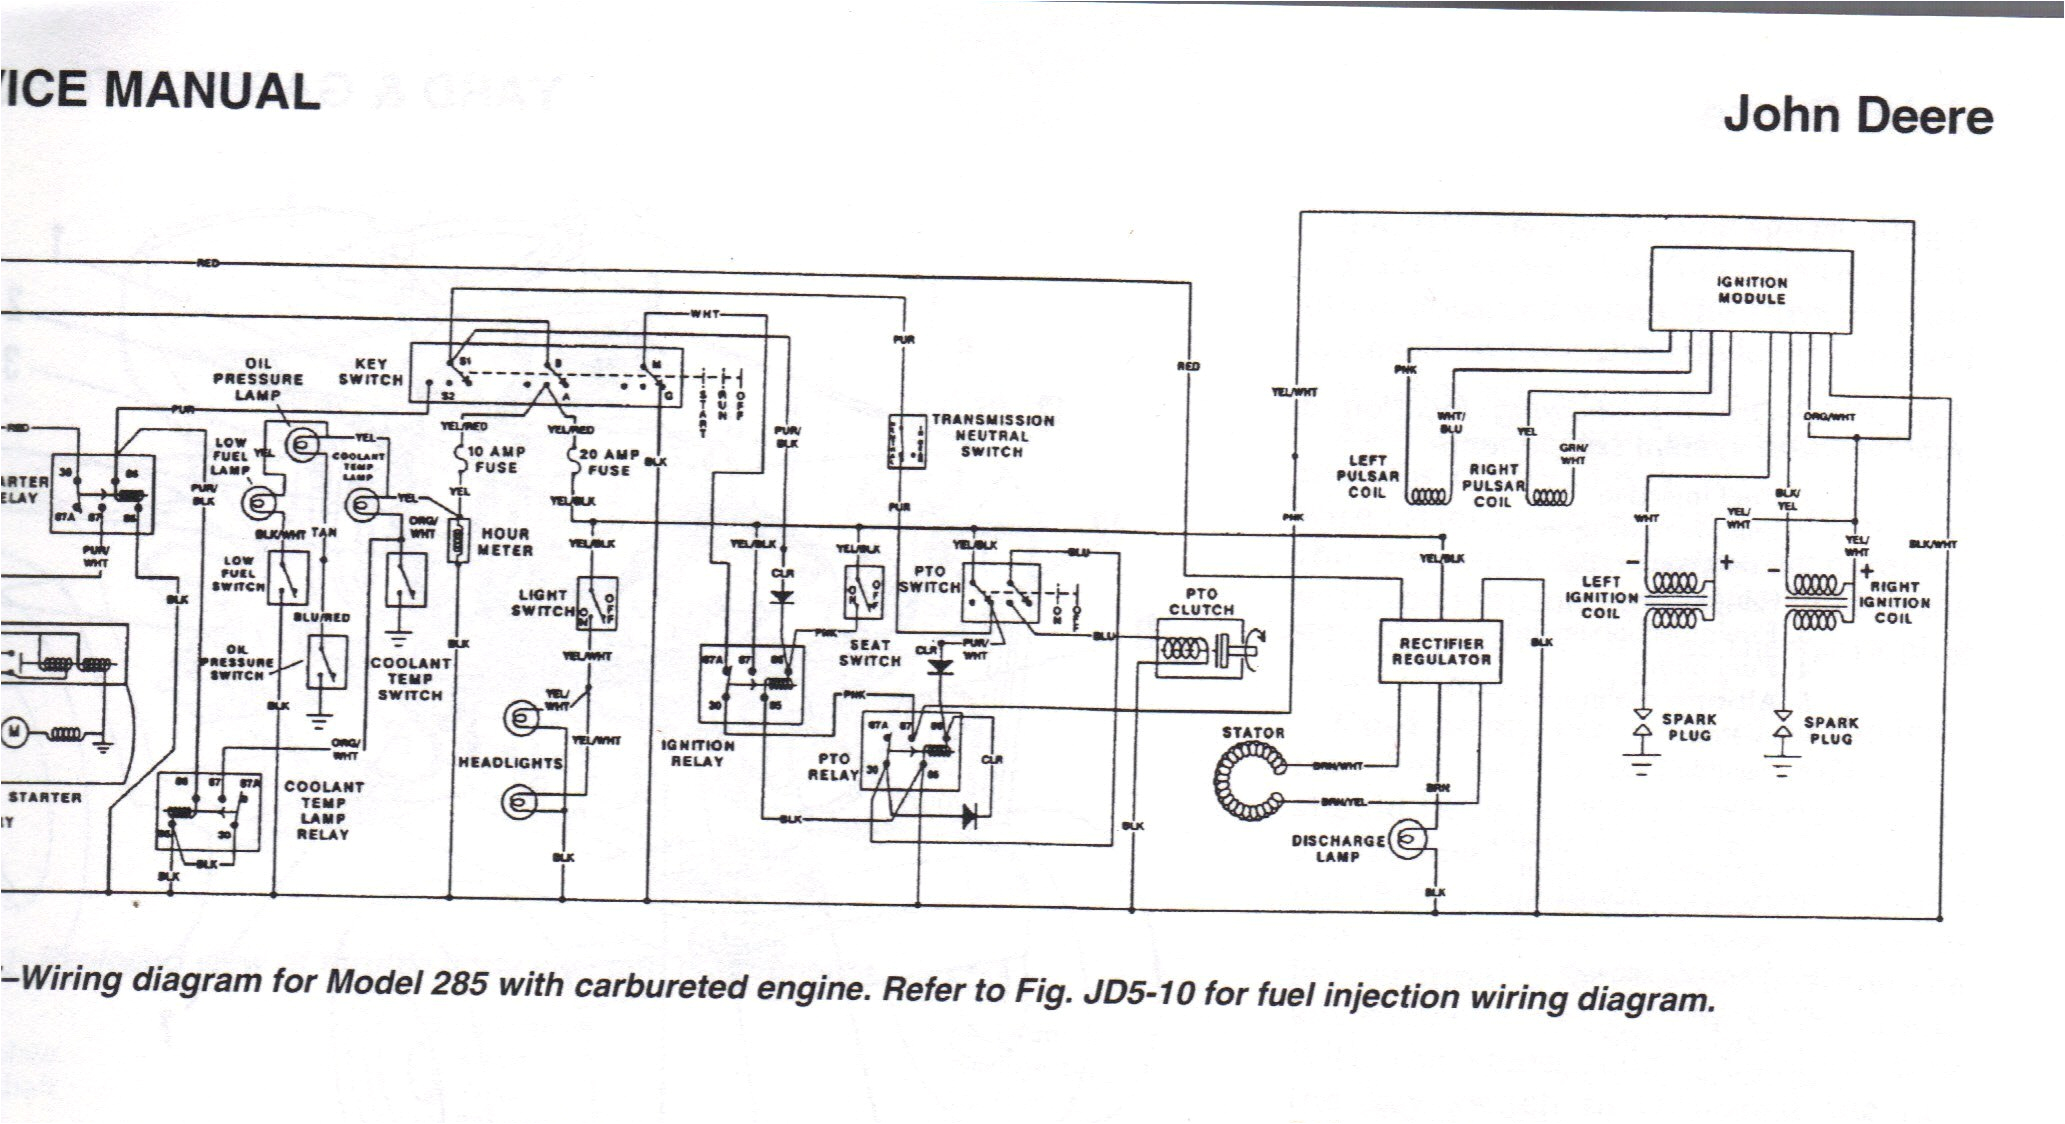 for 420 garden tractor wiring wiring diagram centre for 420 garden tractor wiring source john deere